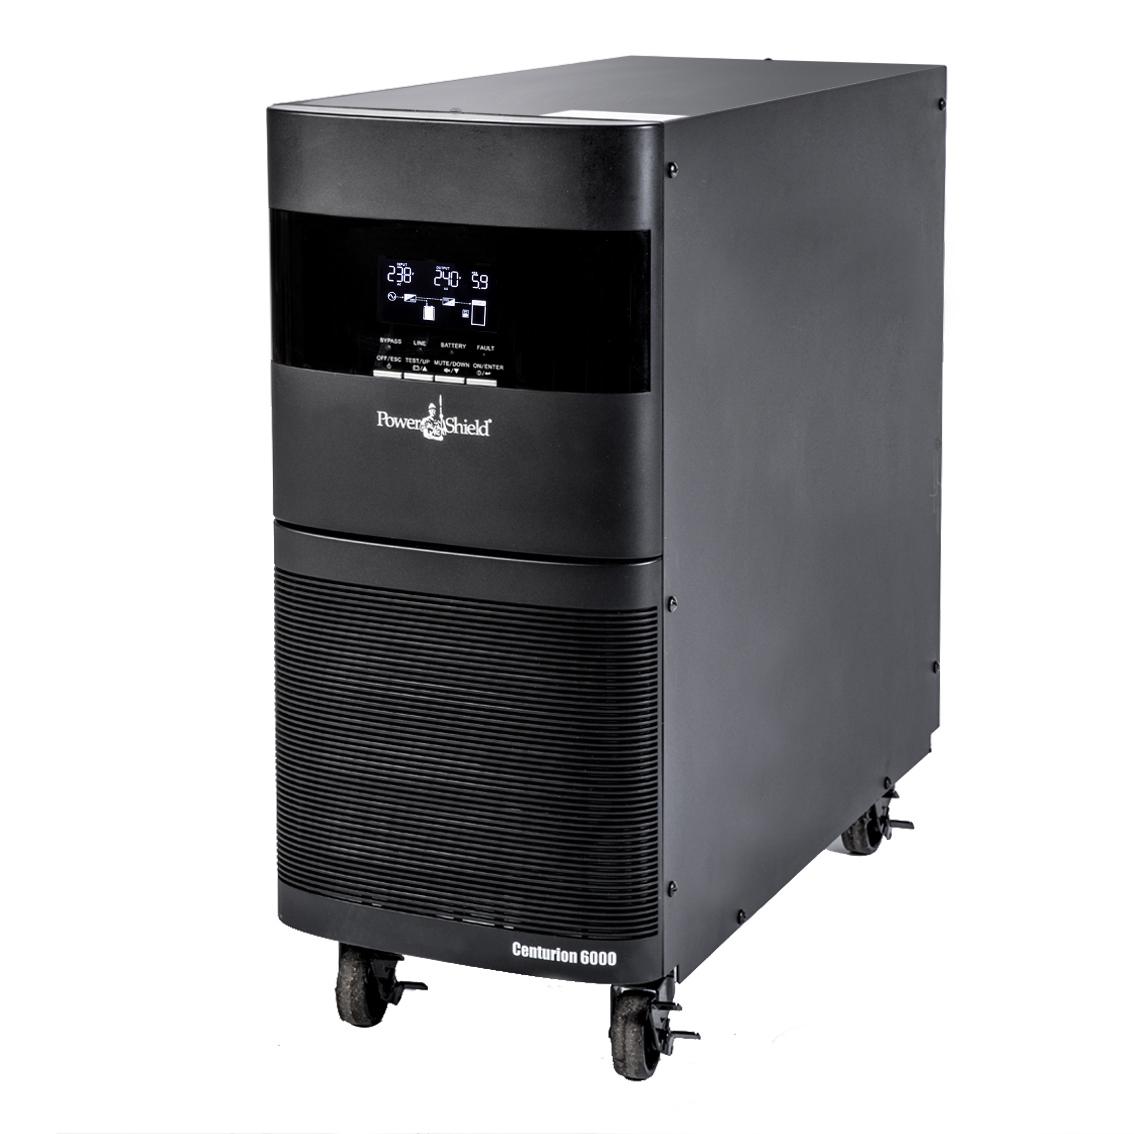 PowerShield Centurion 6000VA Tower UPS, True Online Double Conversion